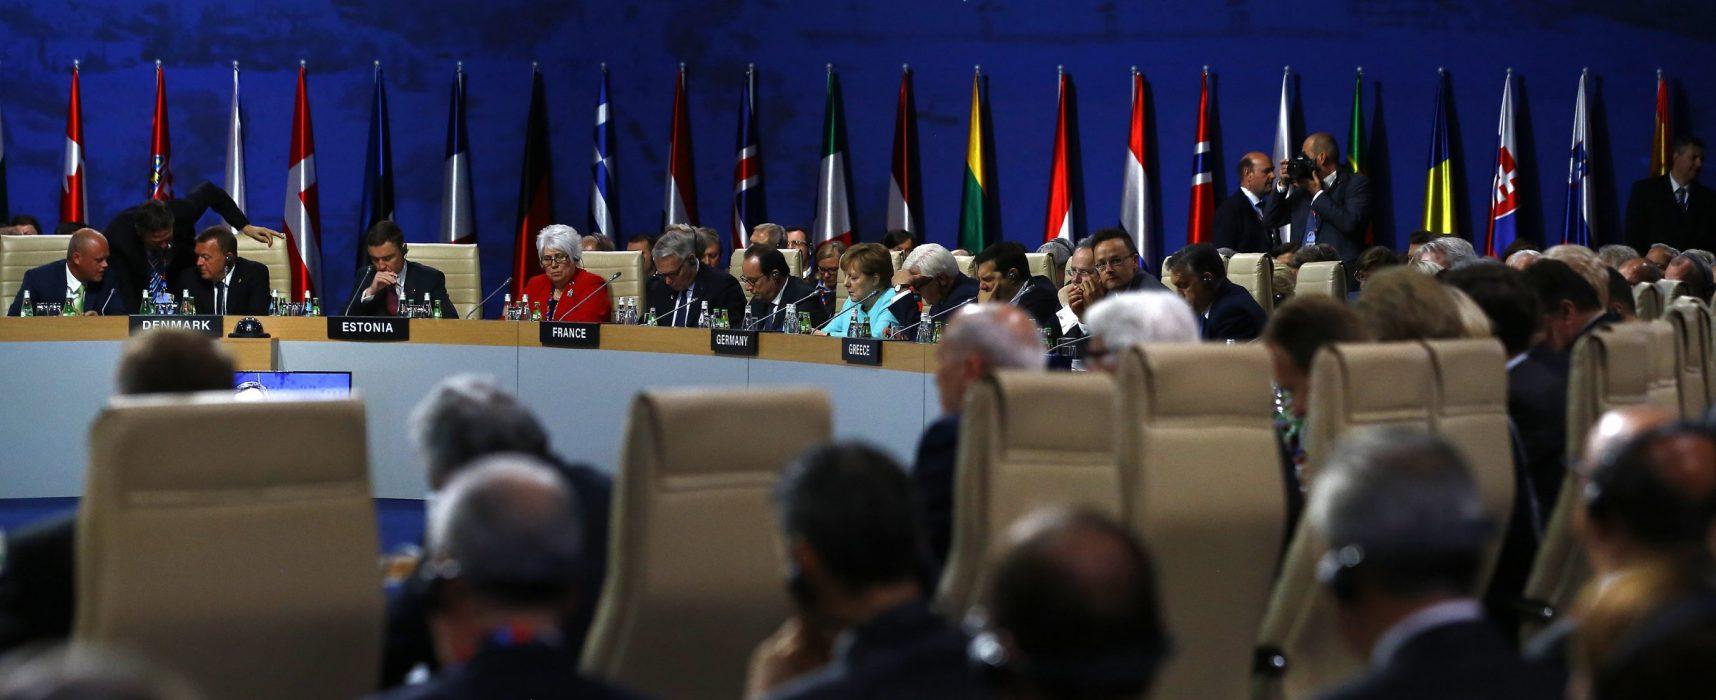 Paranoia a neexistující hrozba, píší ruská média o summitu NATO